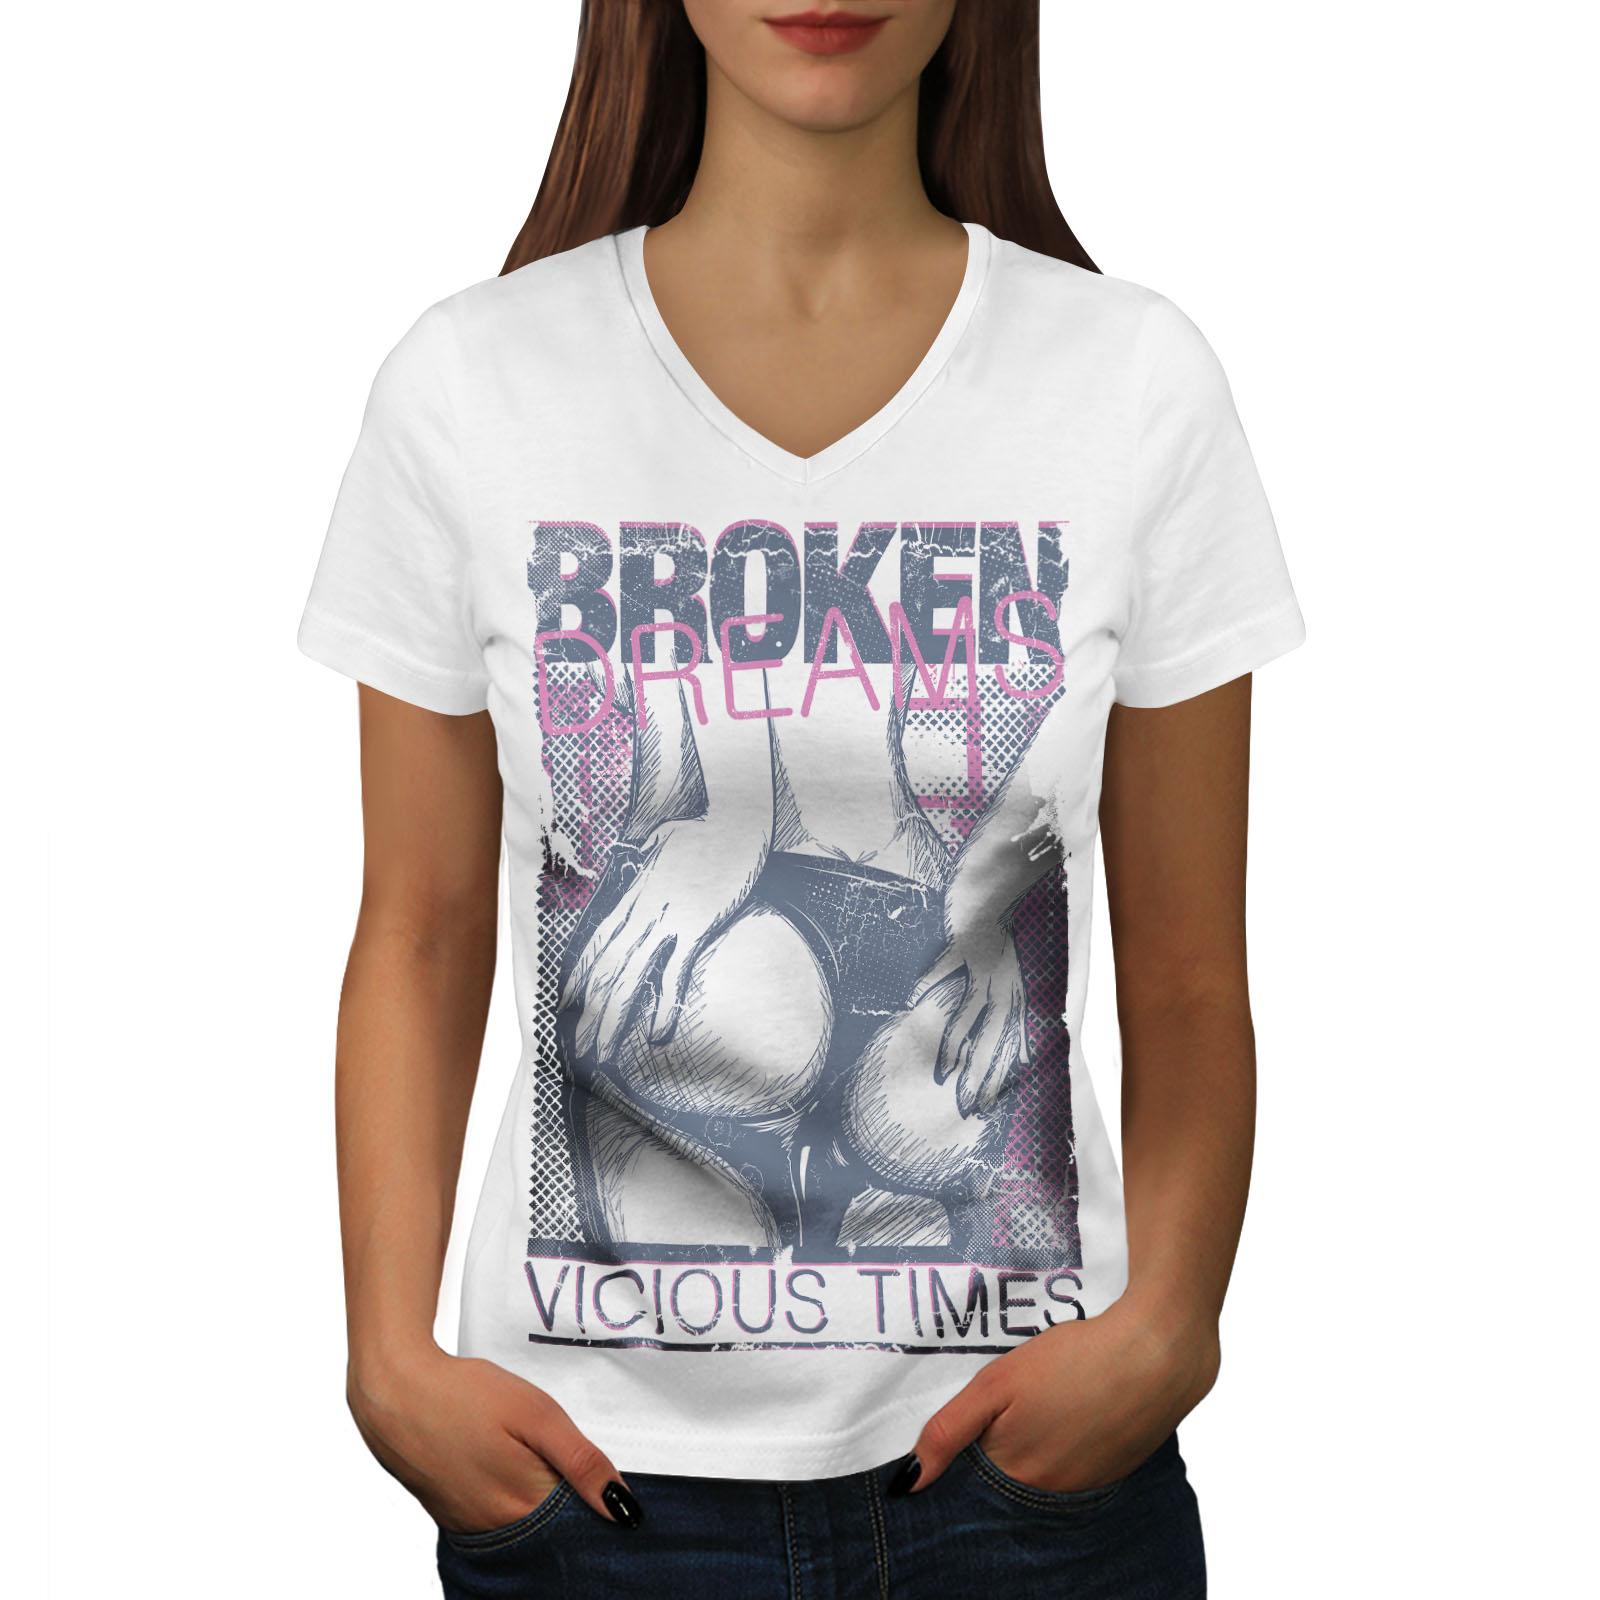 Wellcoda Girl Erotic Dress Sexy Womens V-Neck T-shirt